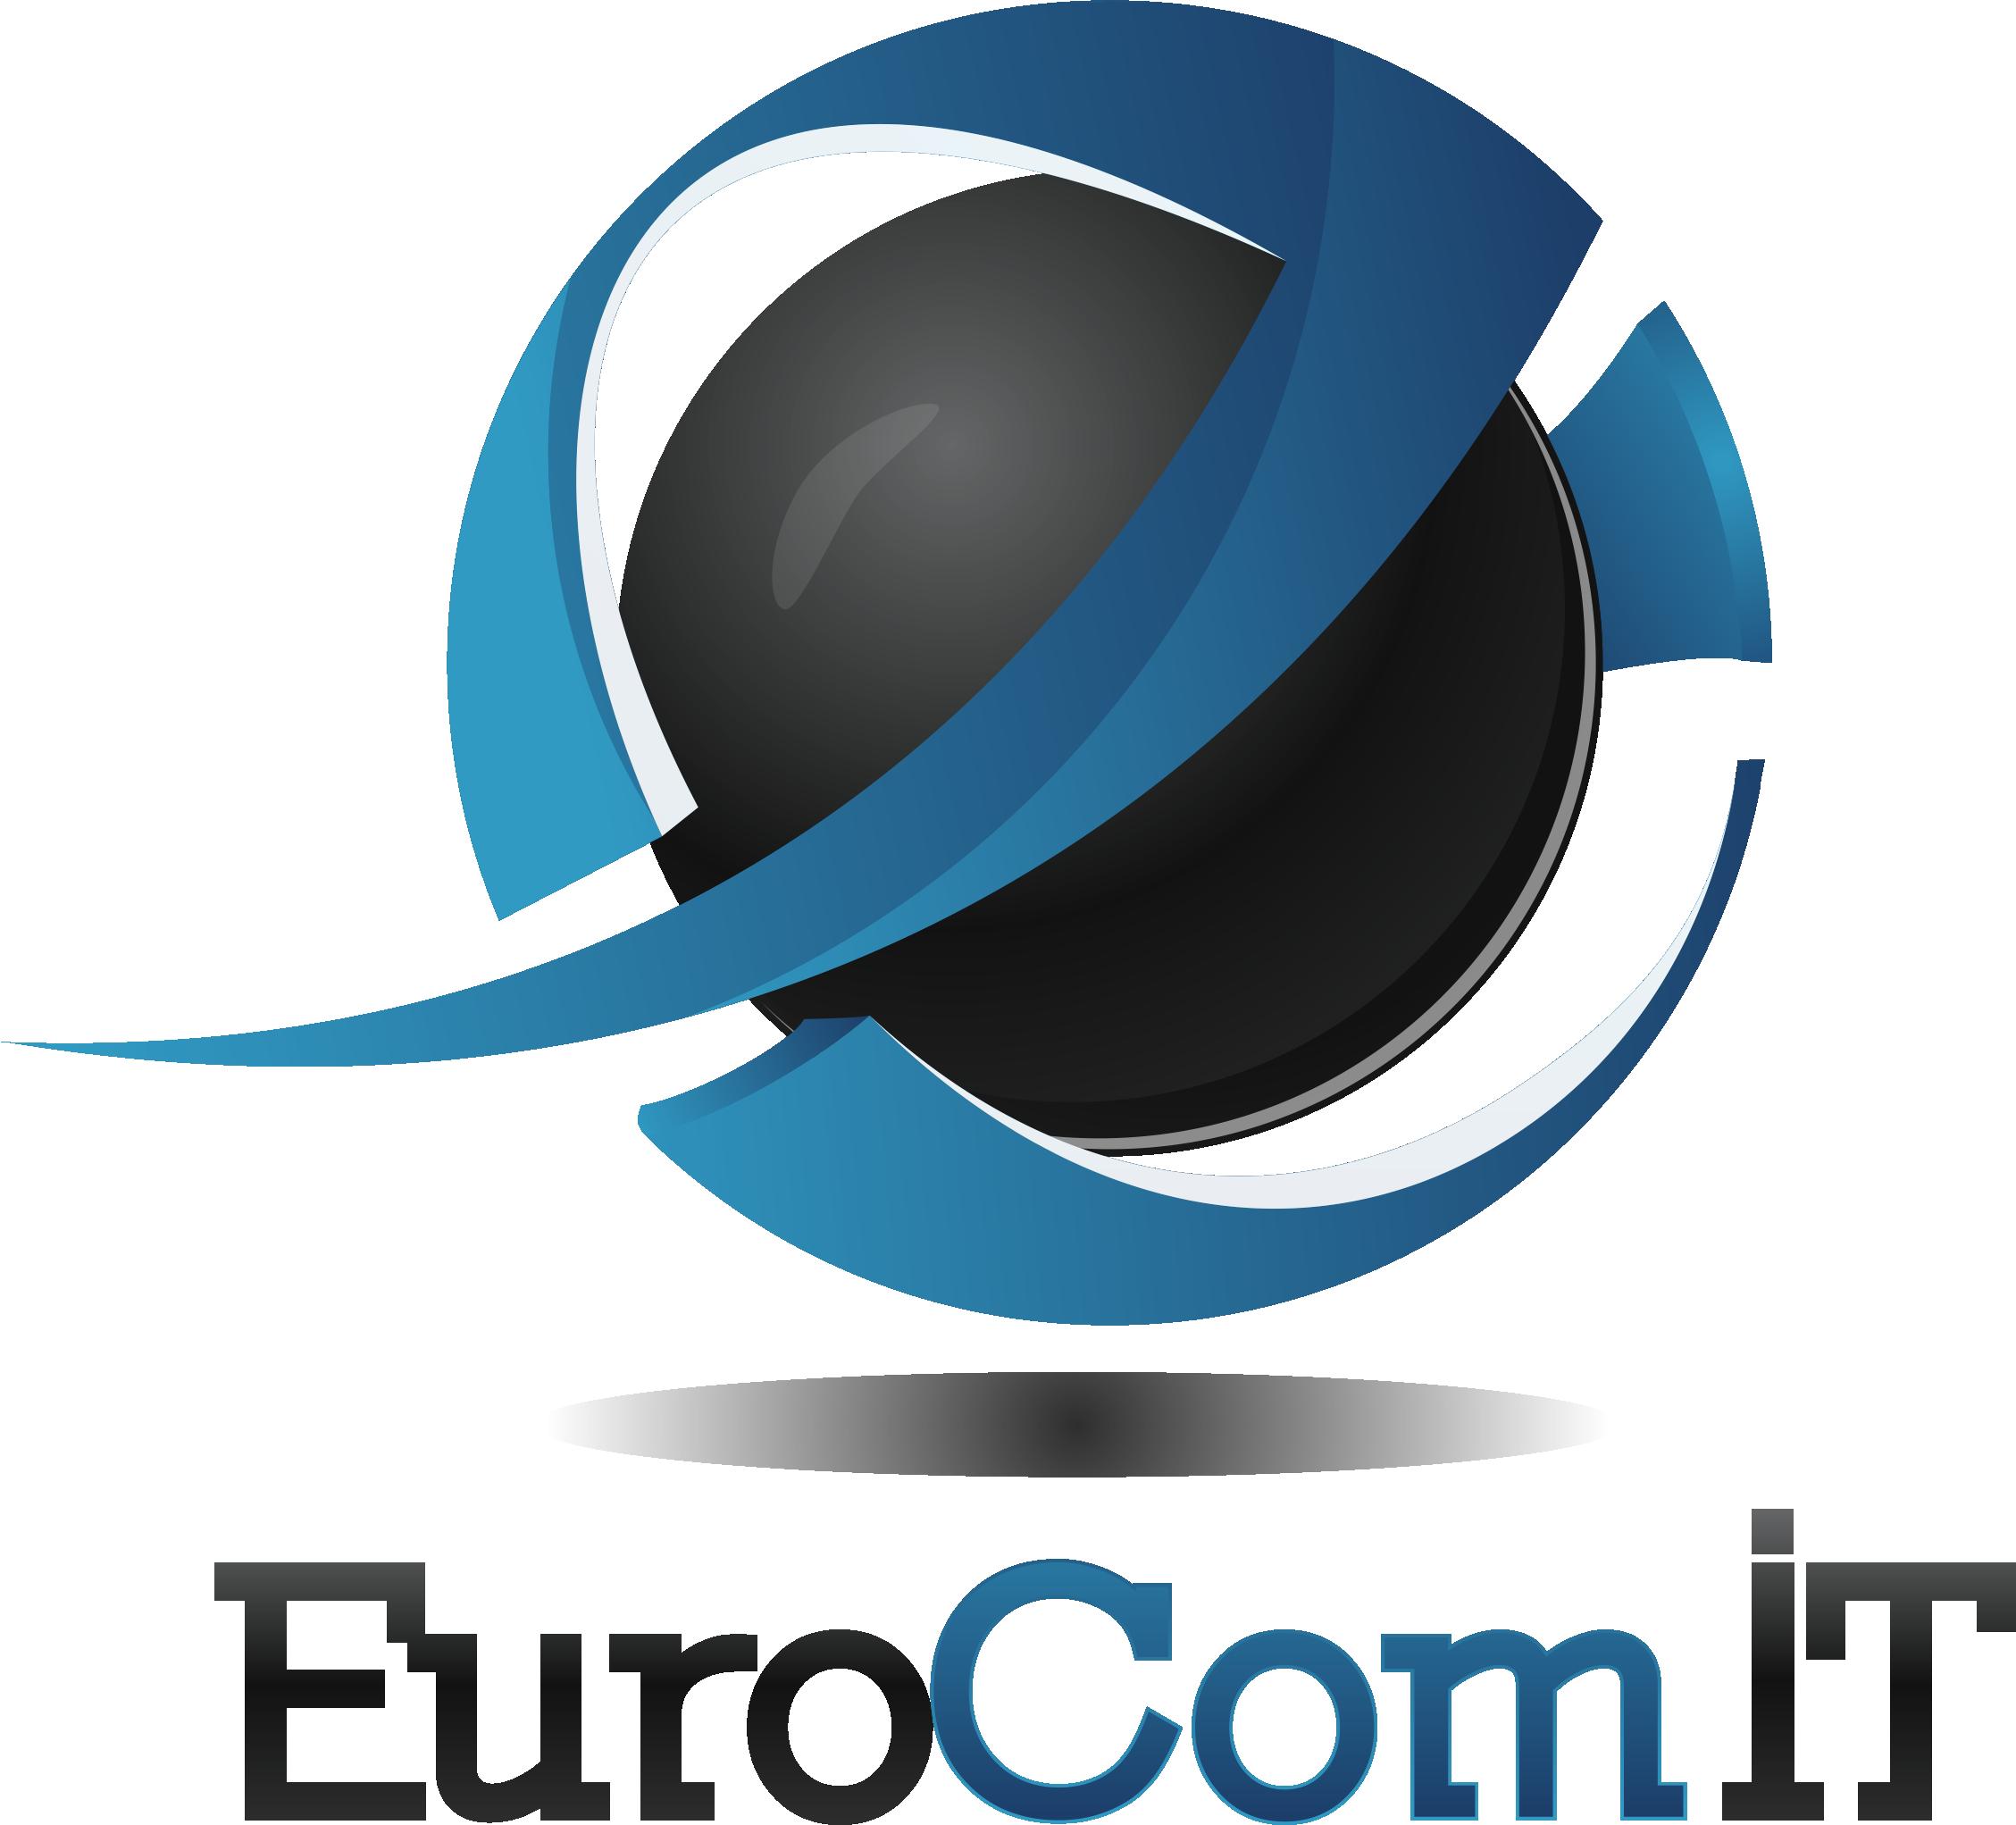 eurocomit_logo